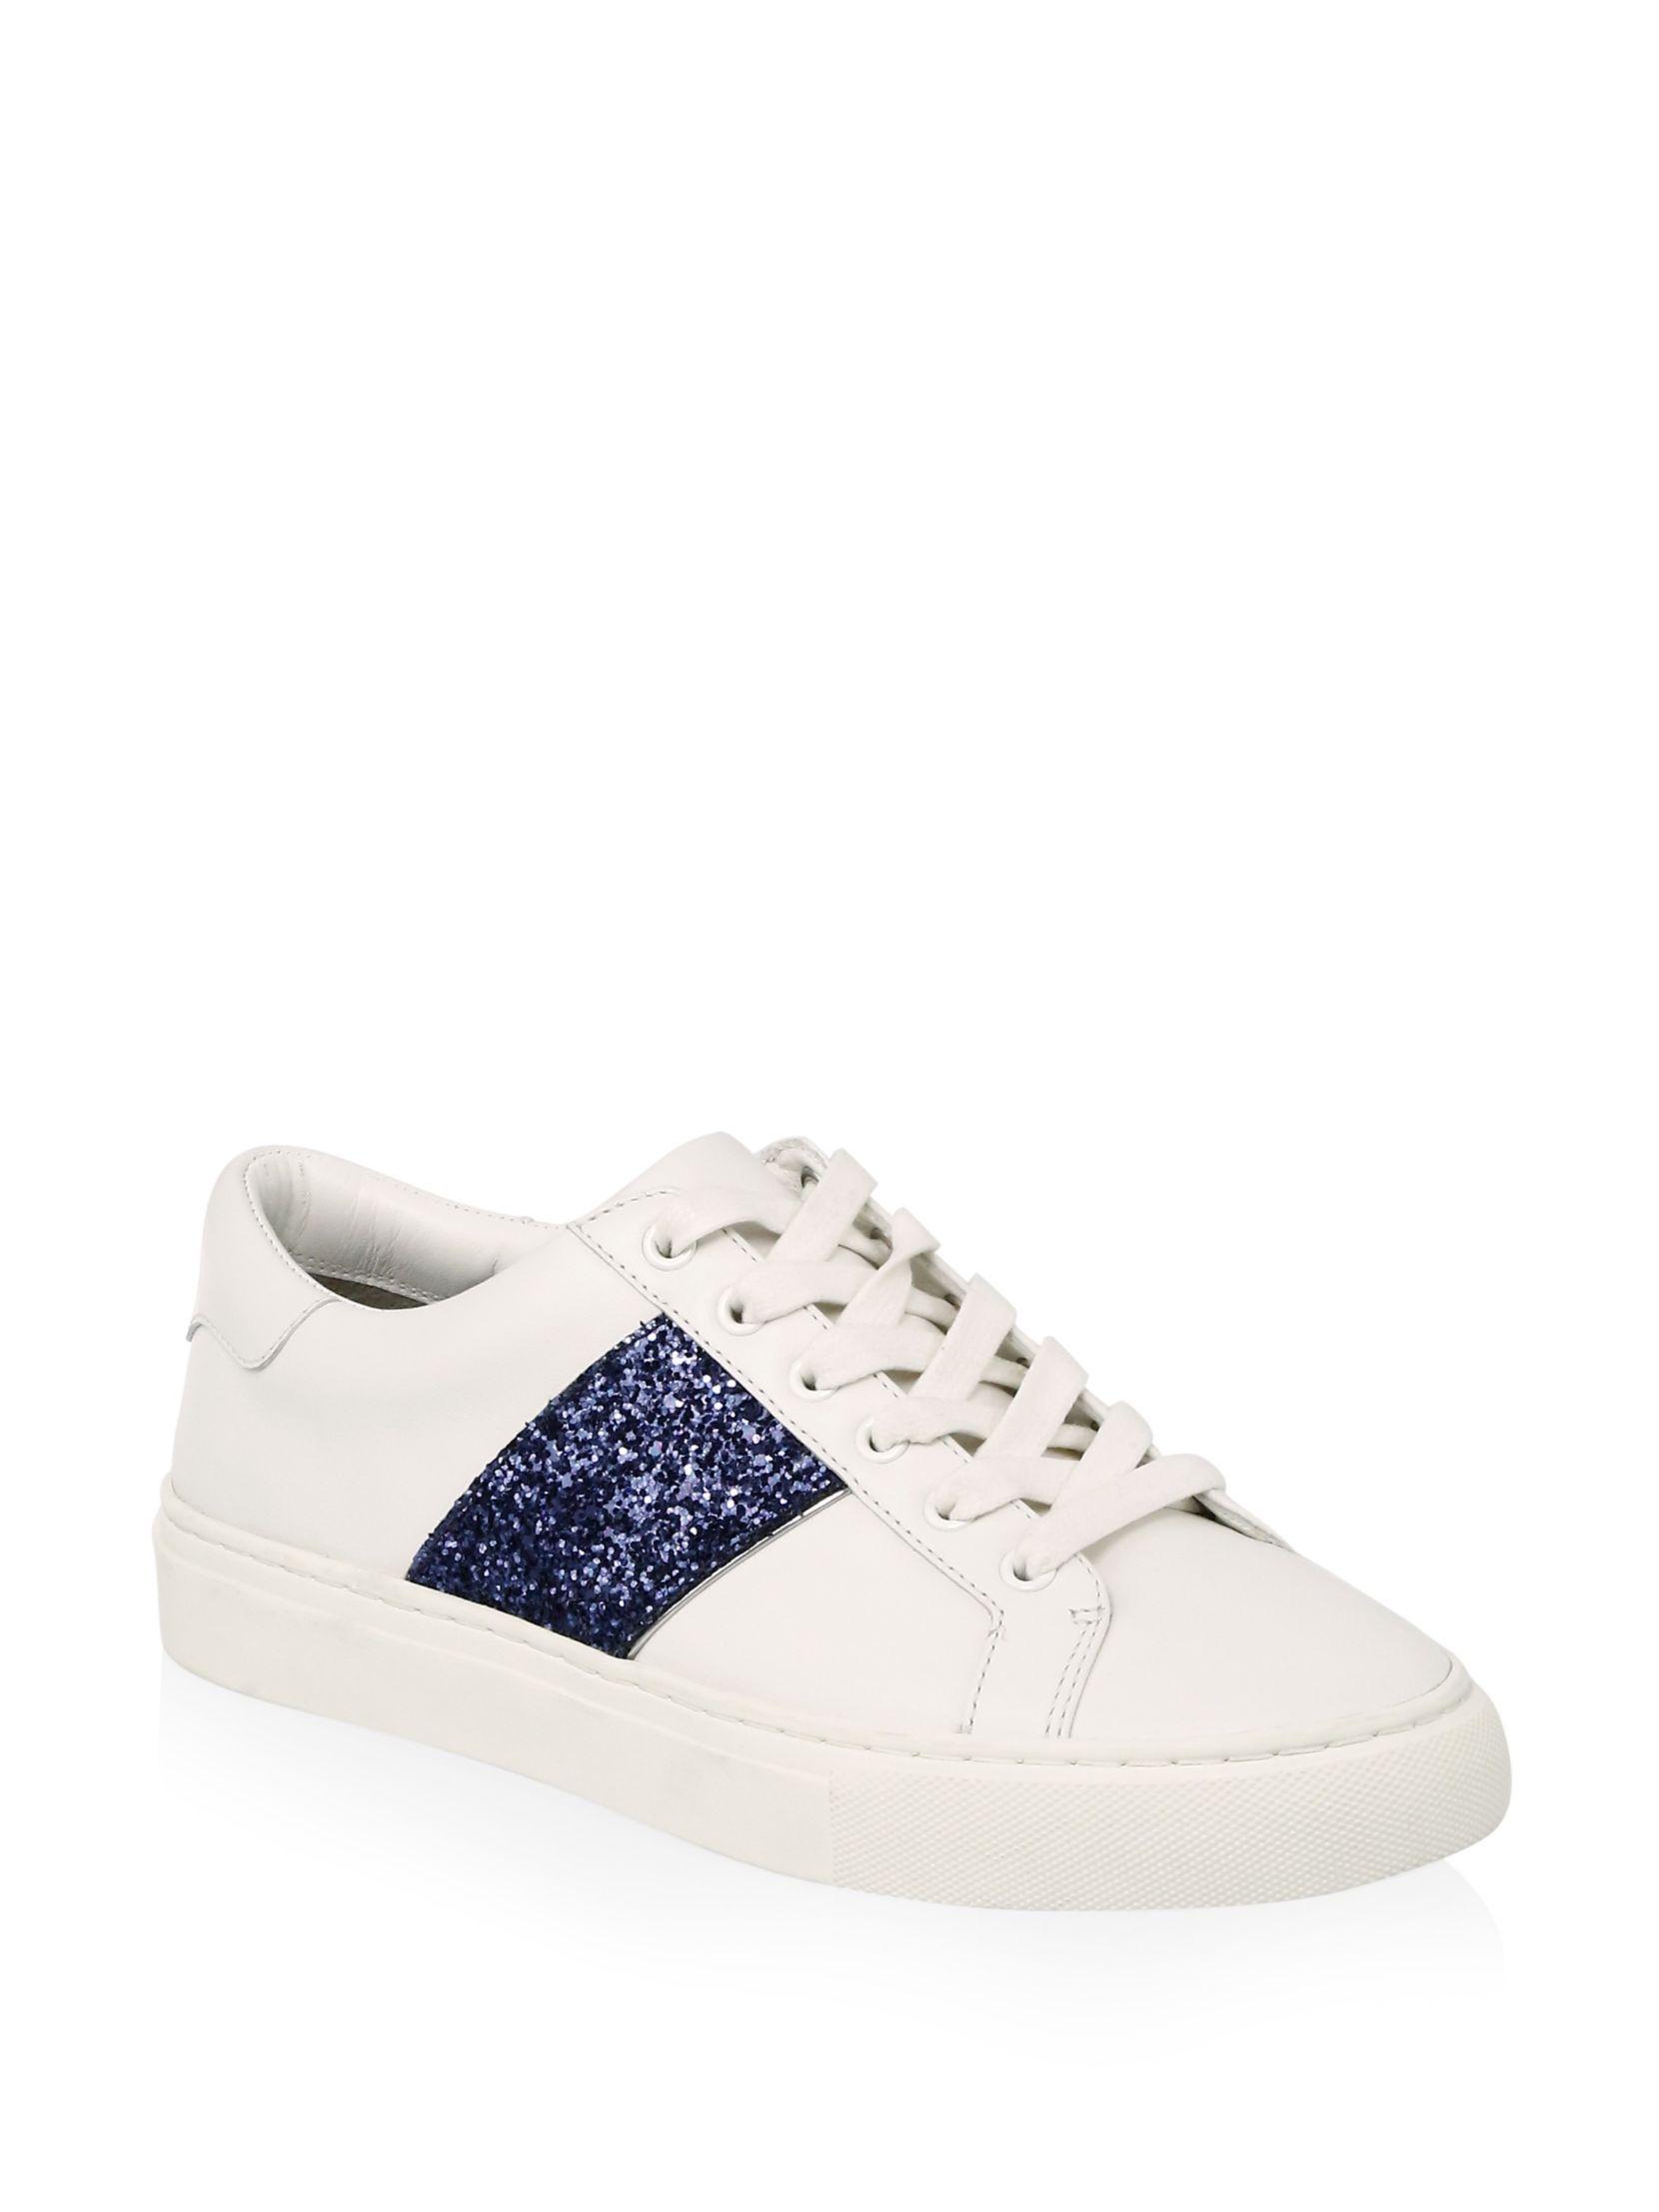 Tory BurchCarter Glitter Lace-Up Sneaker Bgx3zFY93W